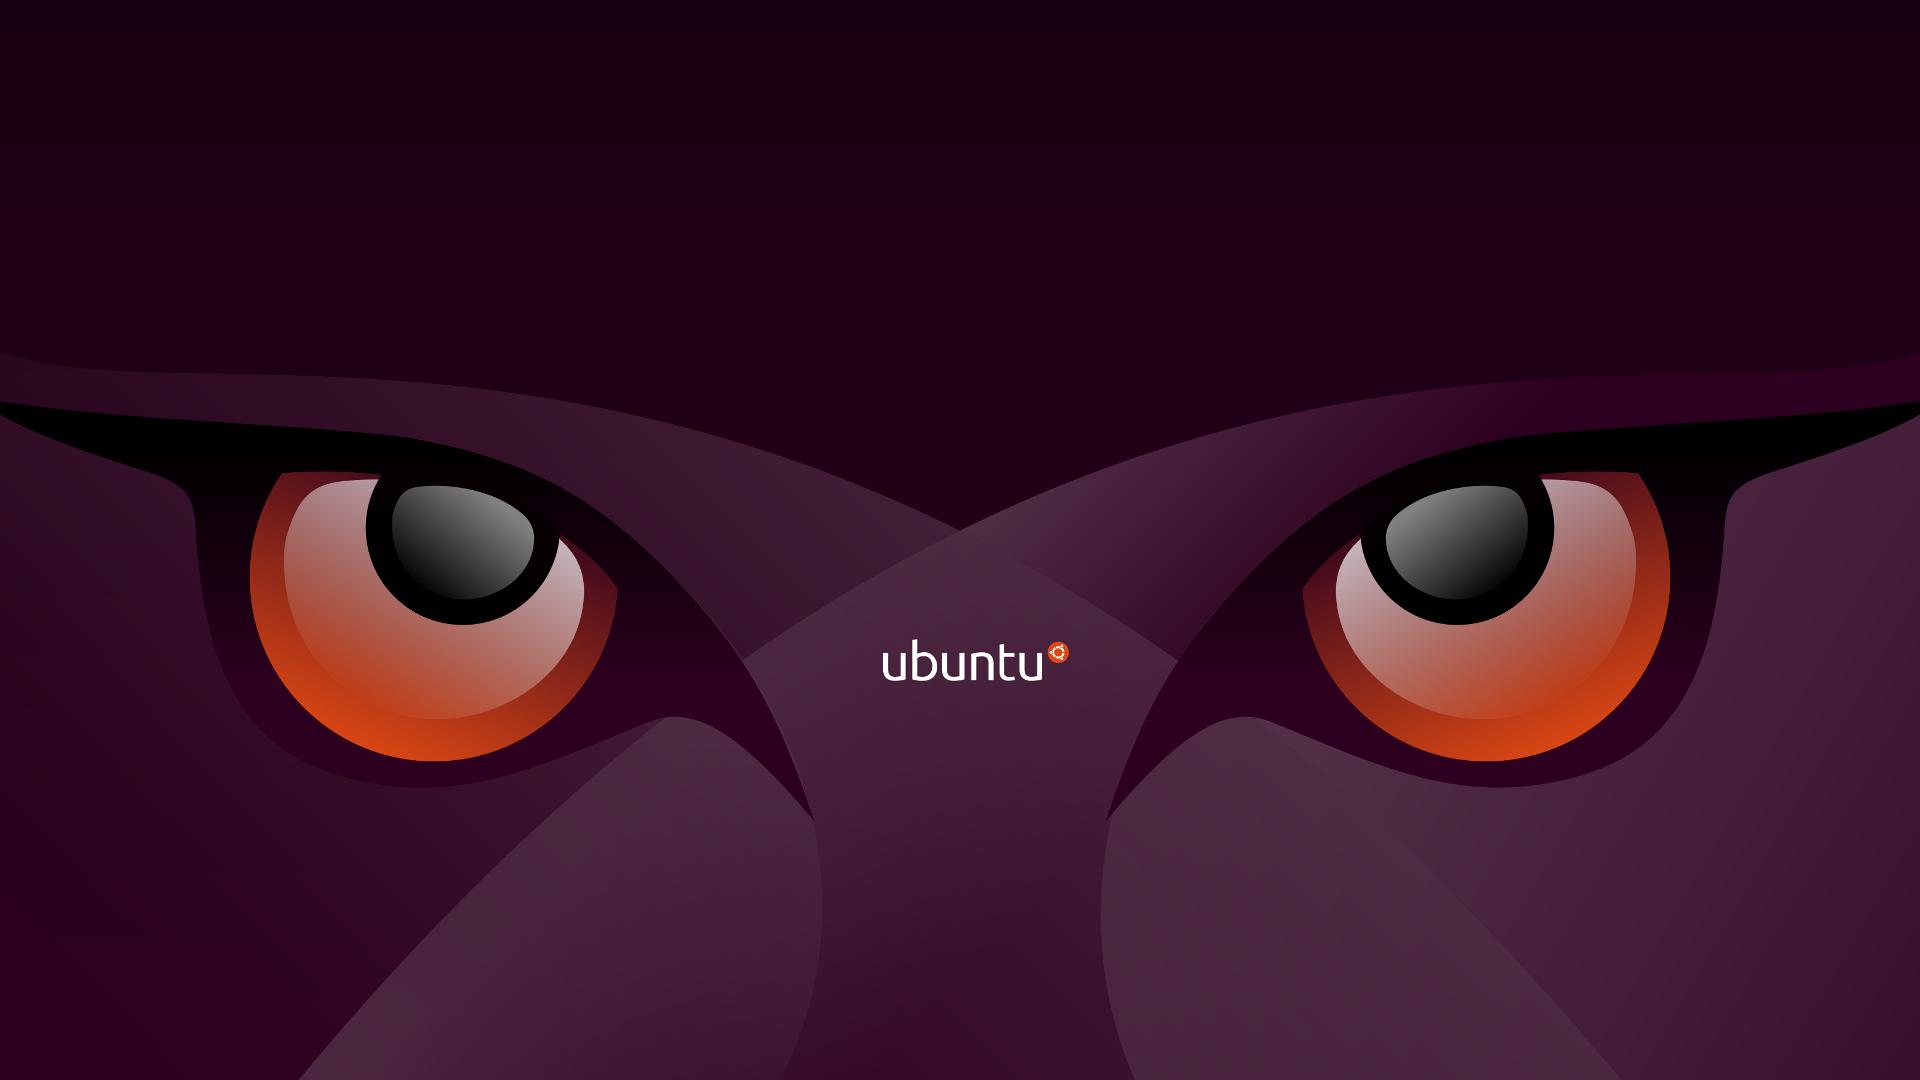 Ubuntu Desktop Wallpapers Group (87+).